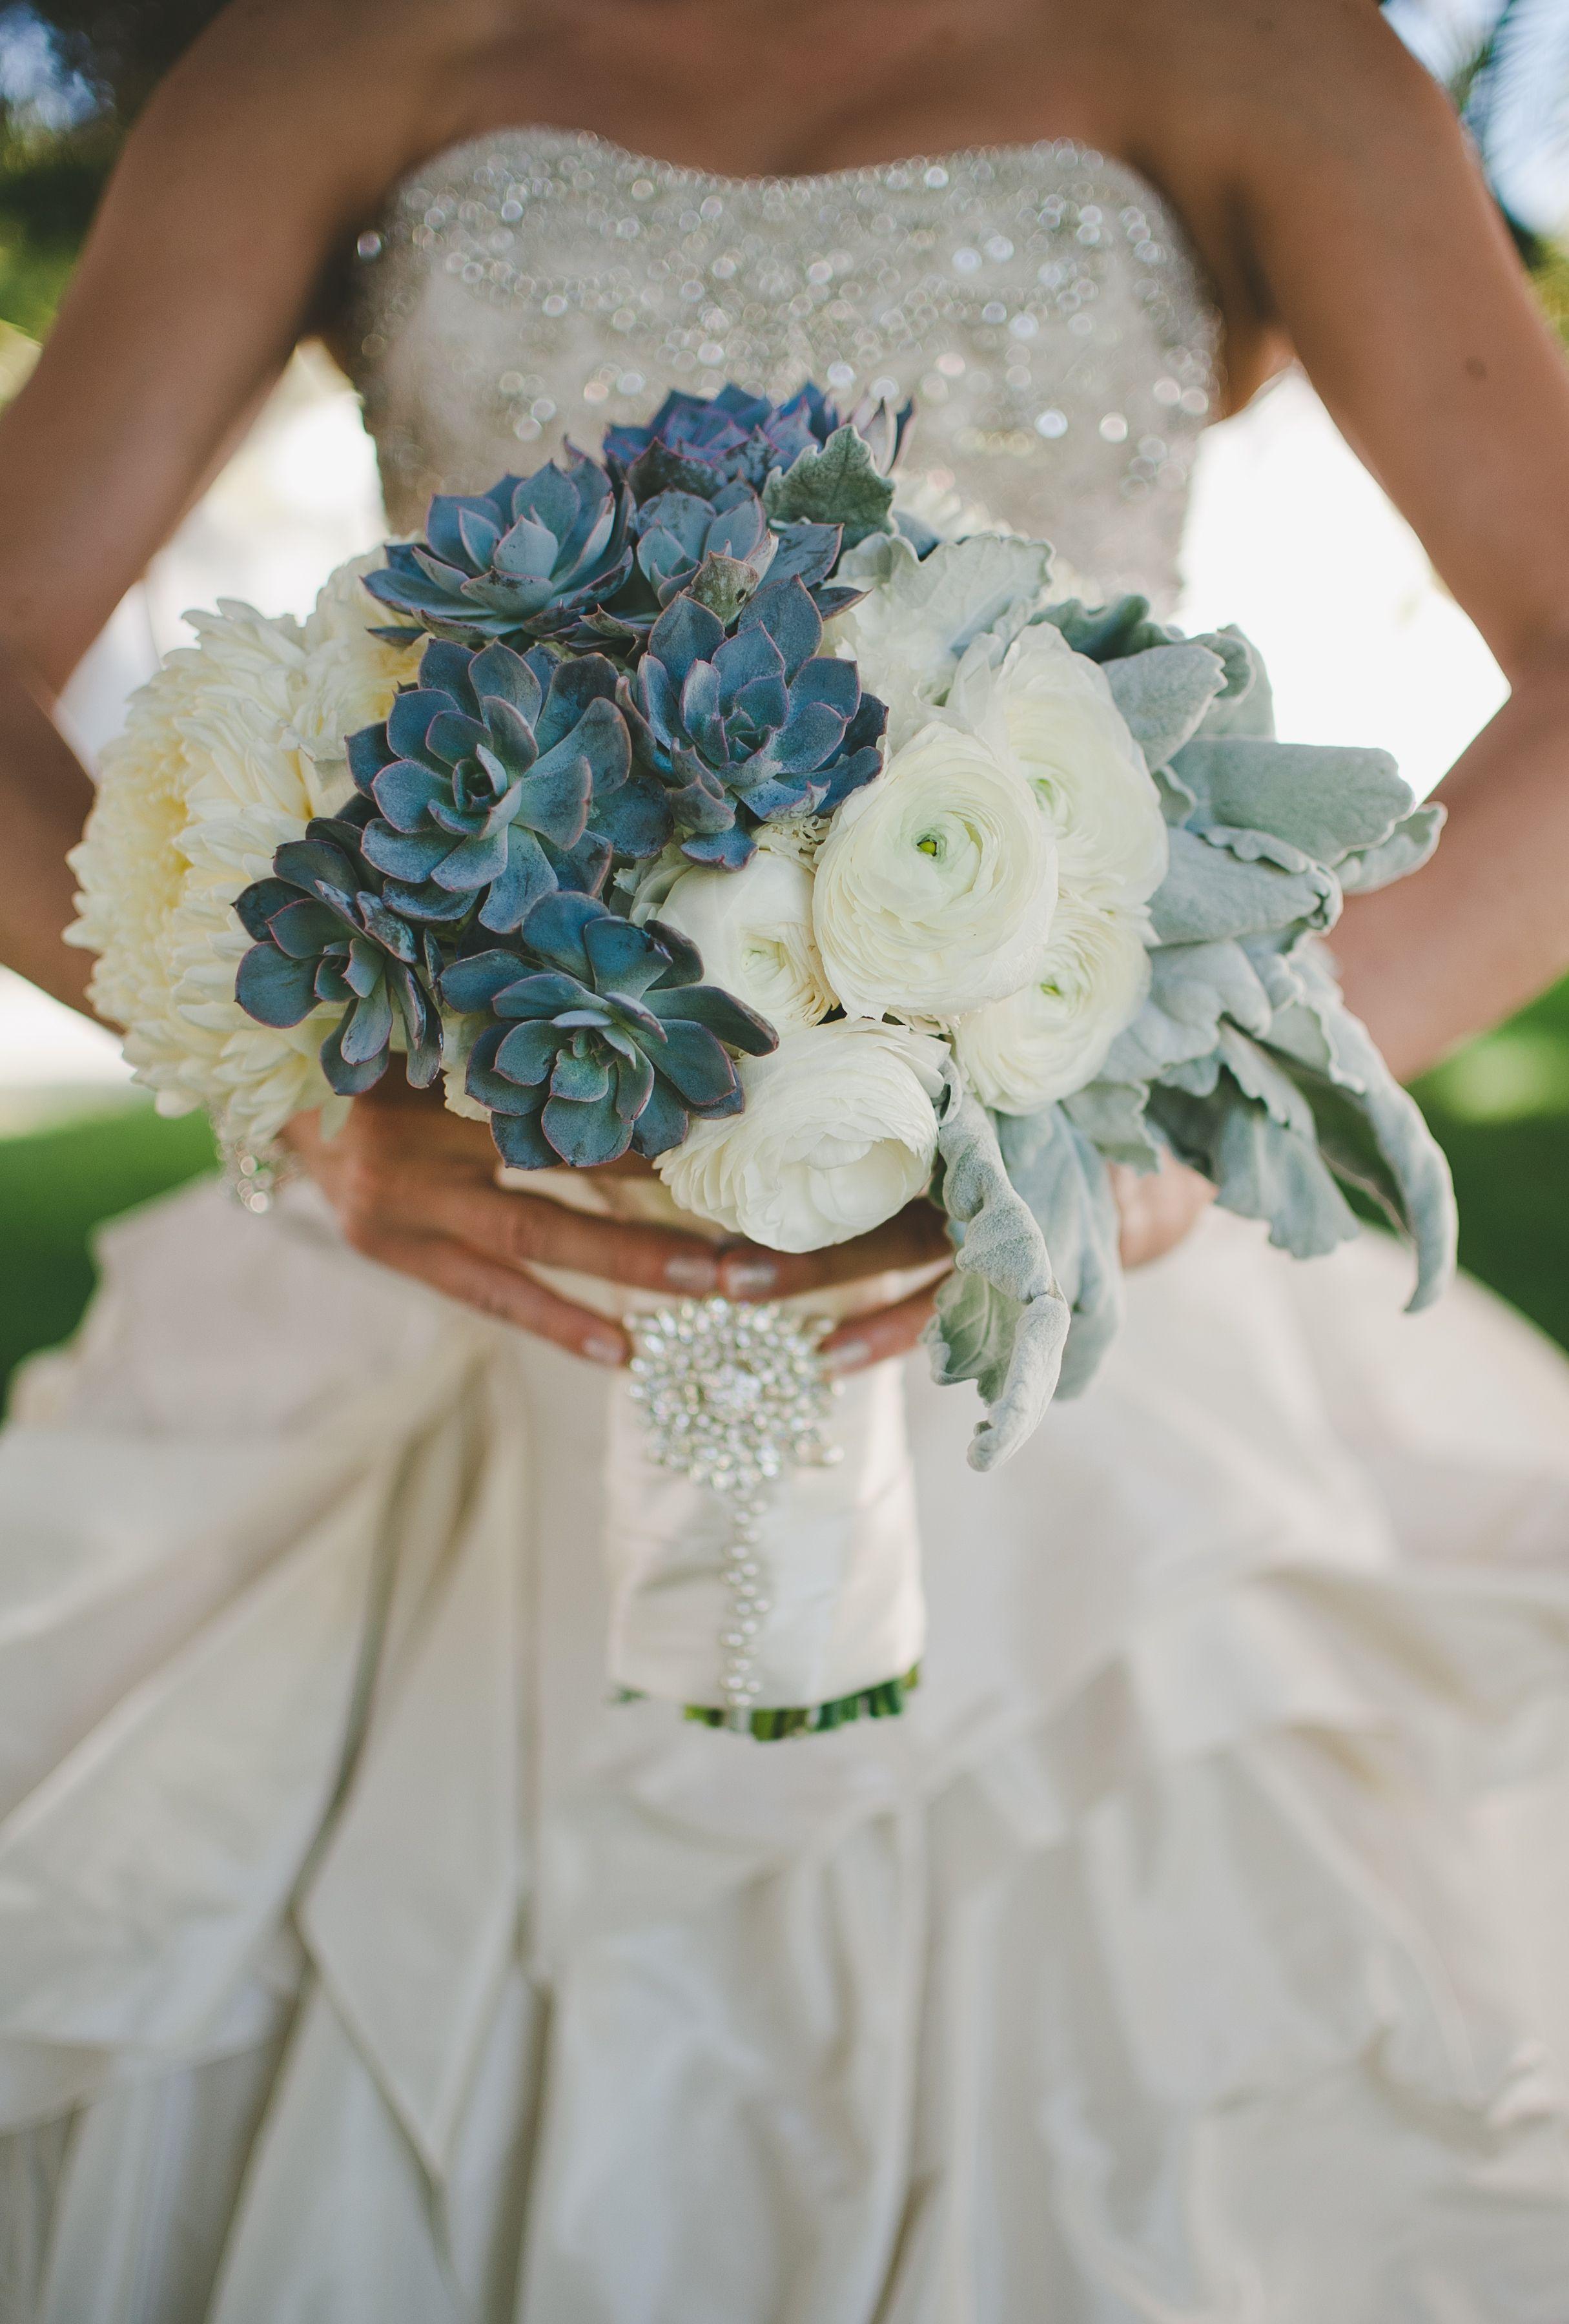 Dusty Blue Wedding Bouquets : Blush botanicals blushbotanicals textured white